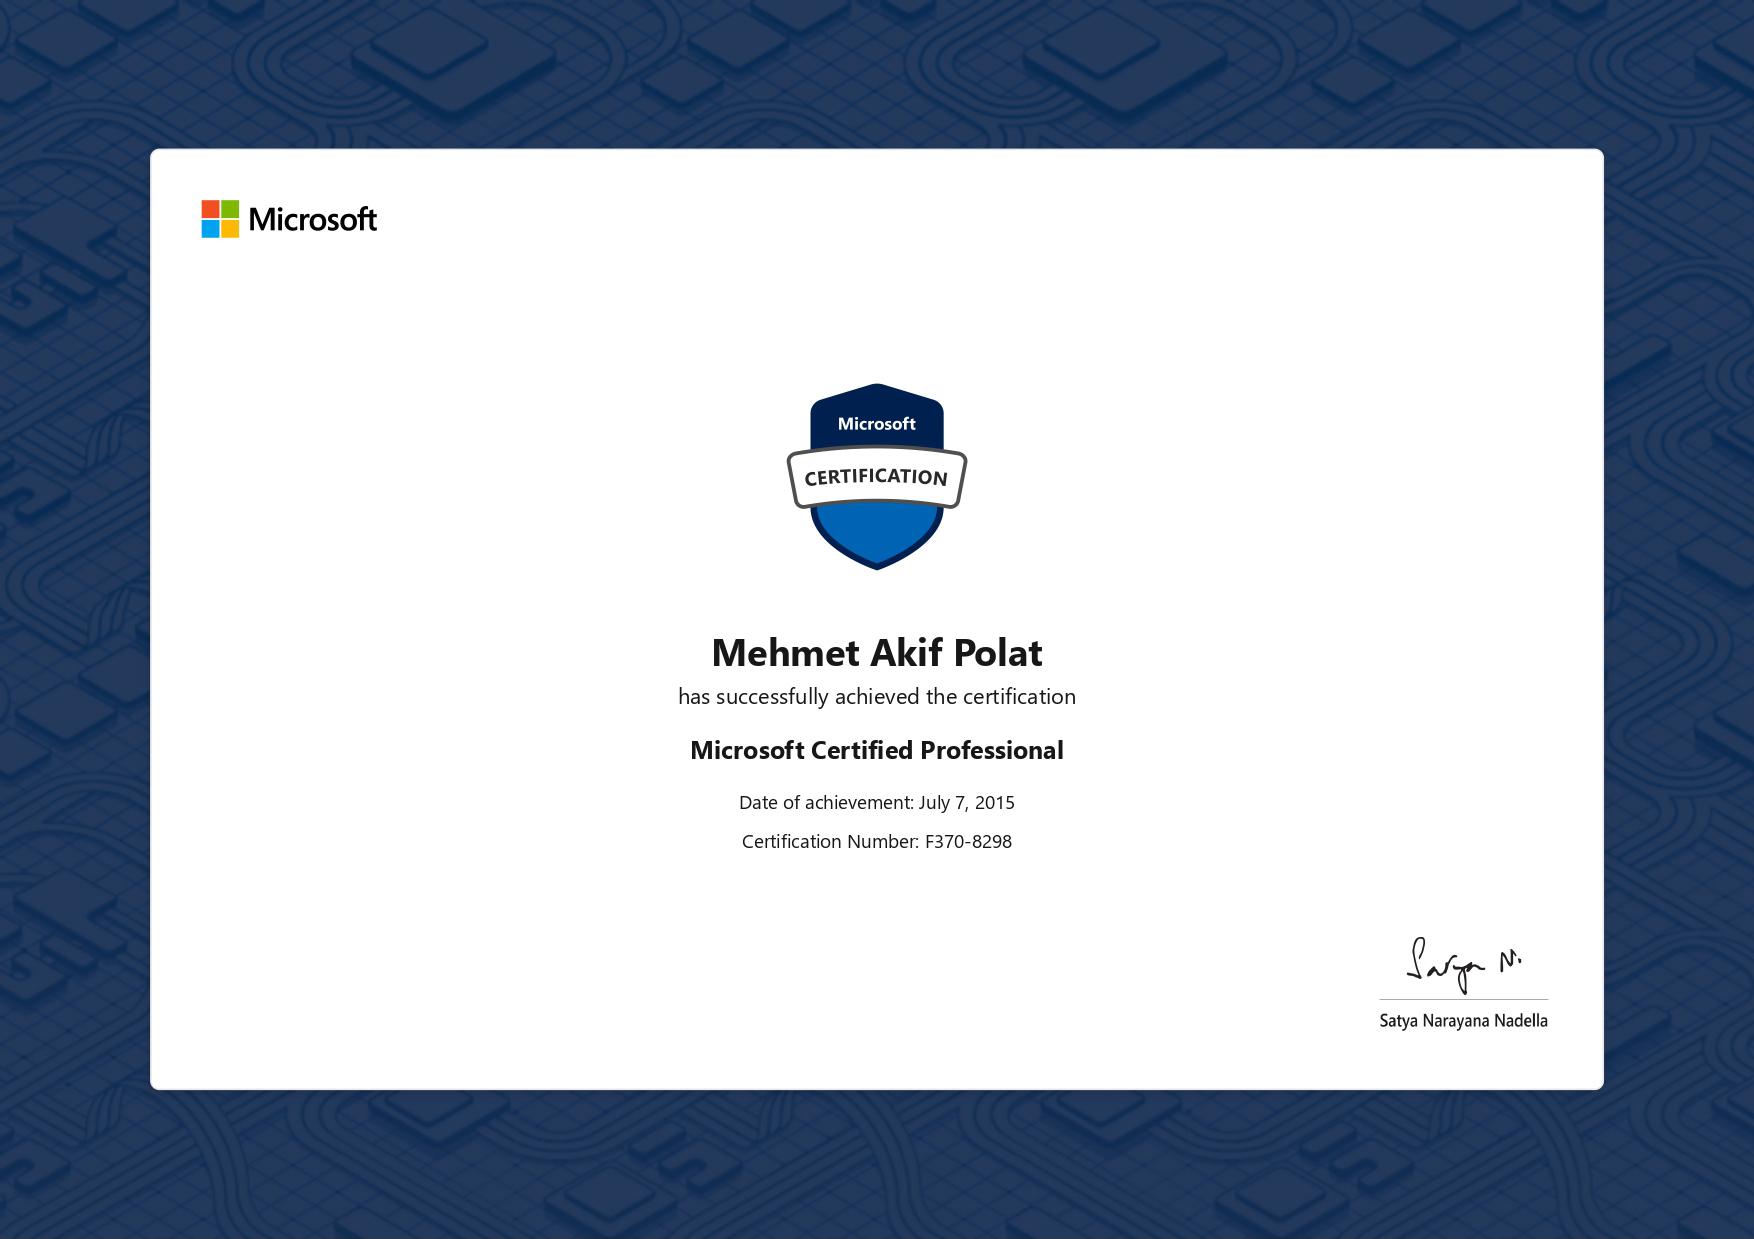 Akif POLAT, Microsoft Certified Professional